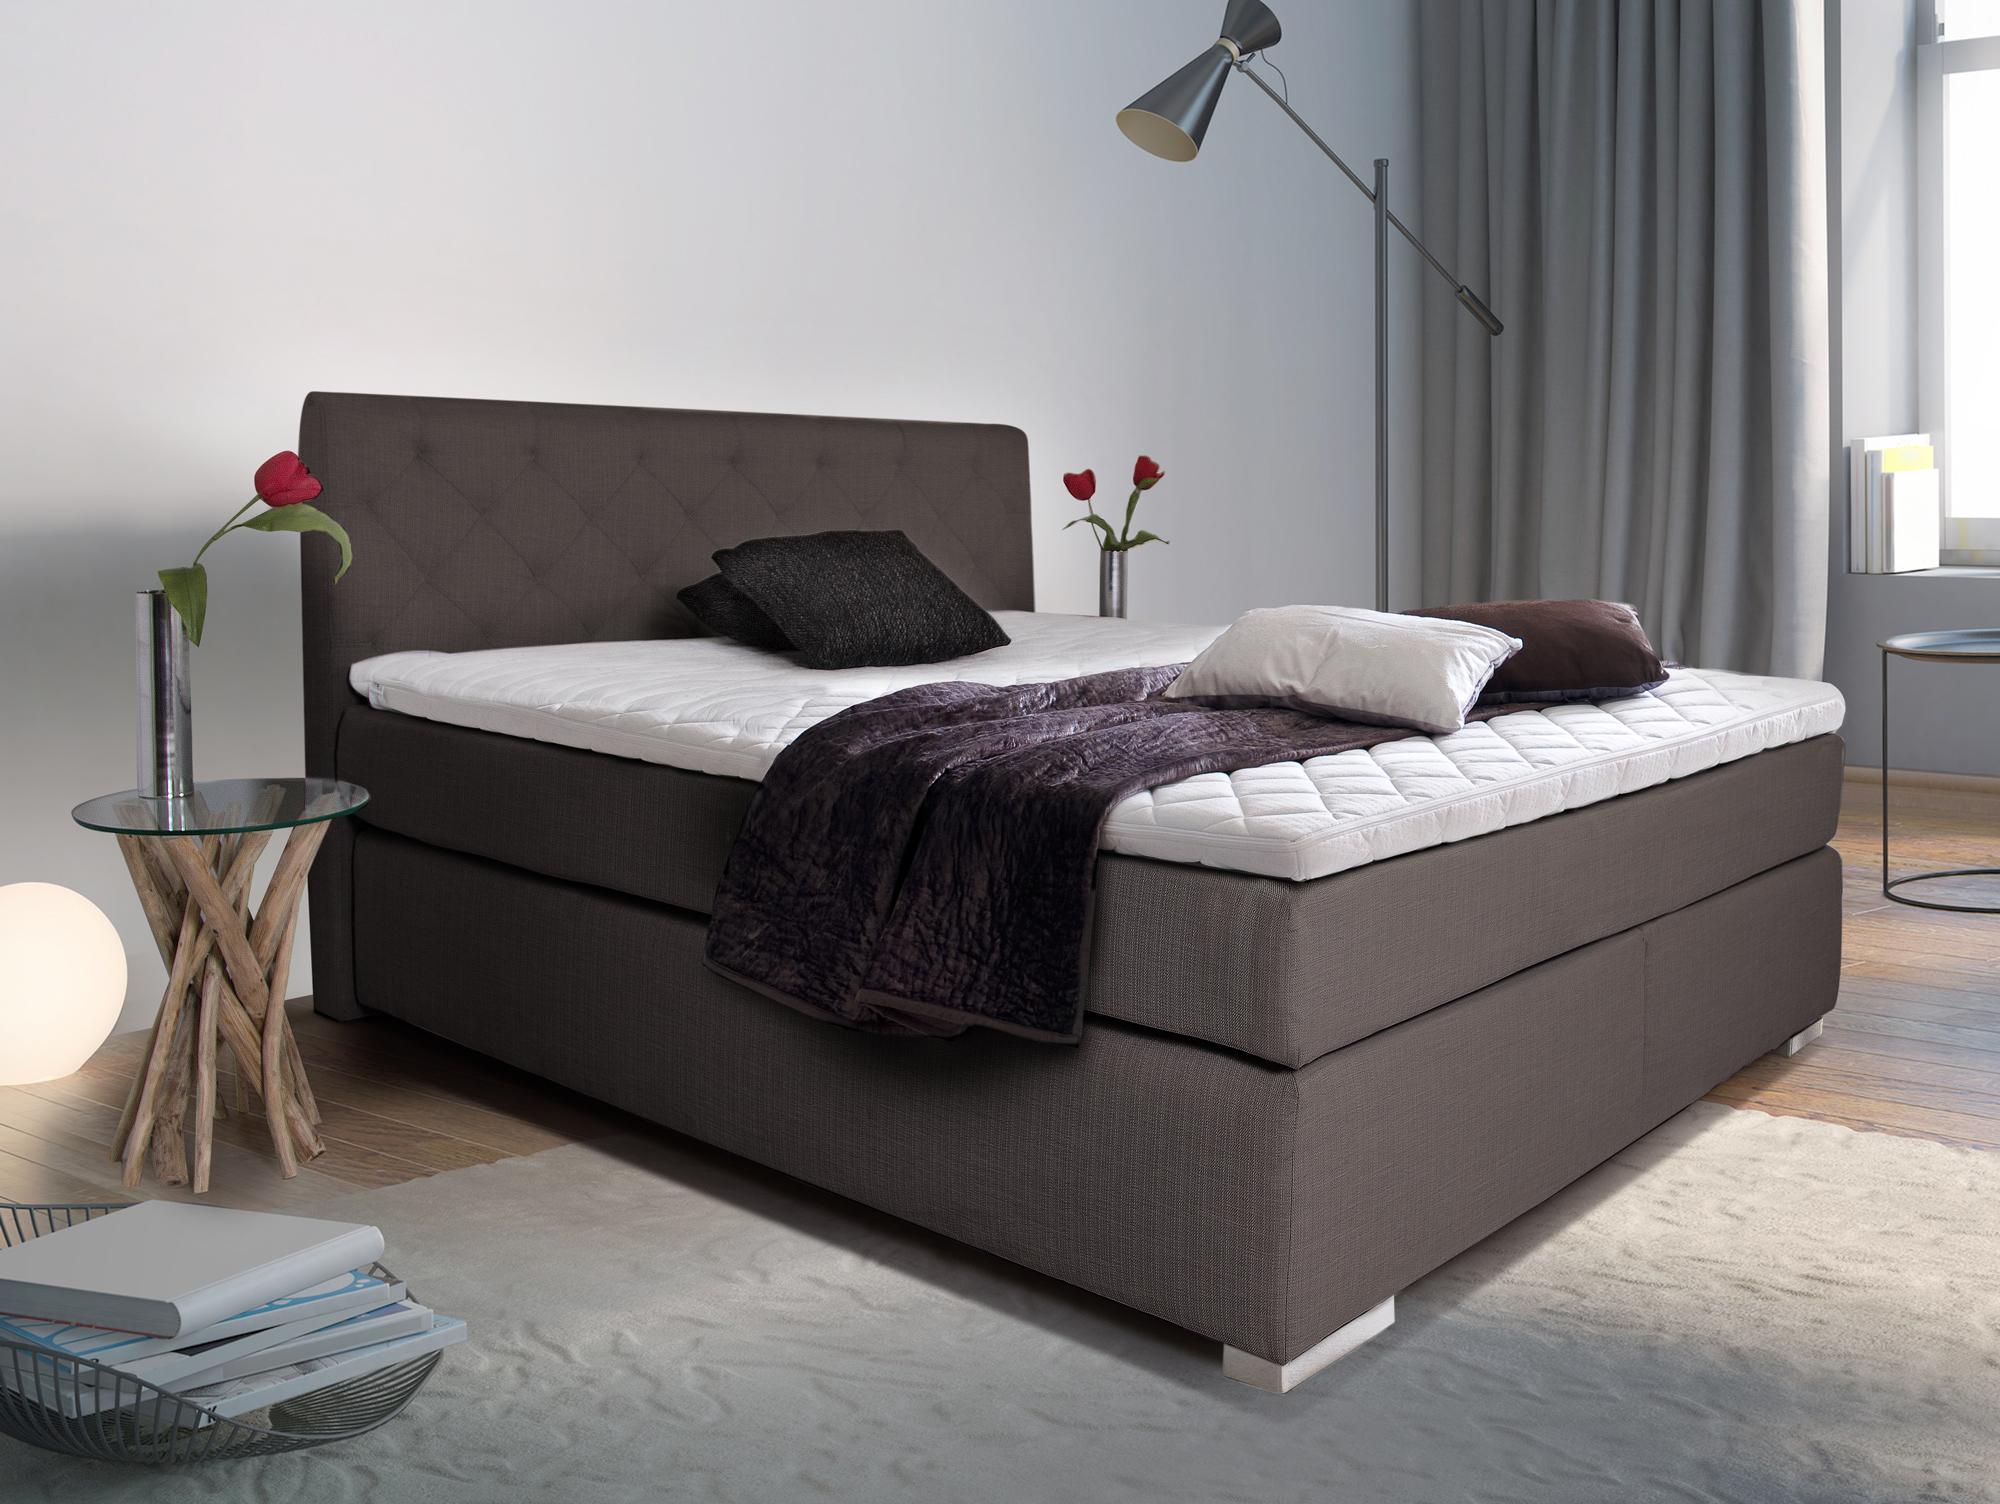 premium boxspringbett inkl kopfteil 100 x 200 cm braun h rtegrad 3. Black Bedroom Furniture Sets. Home Design Ideas